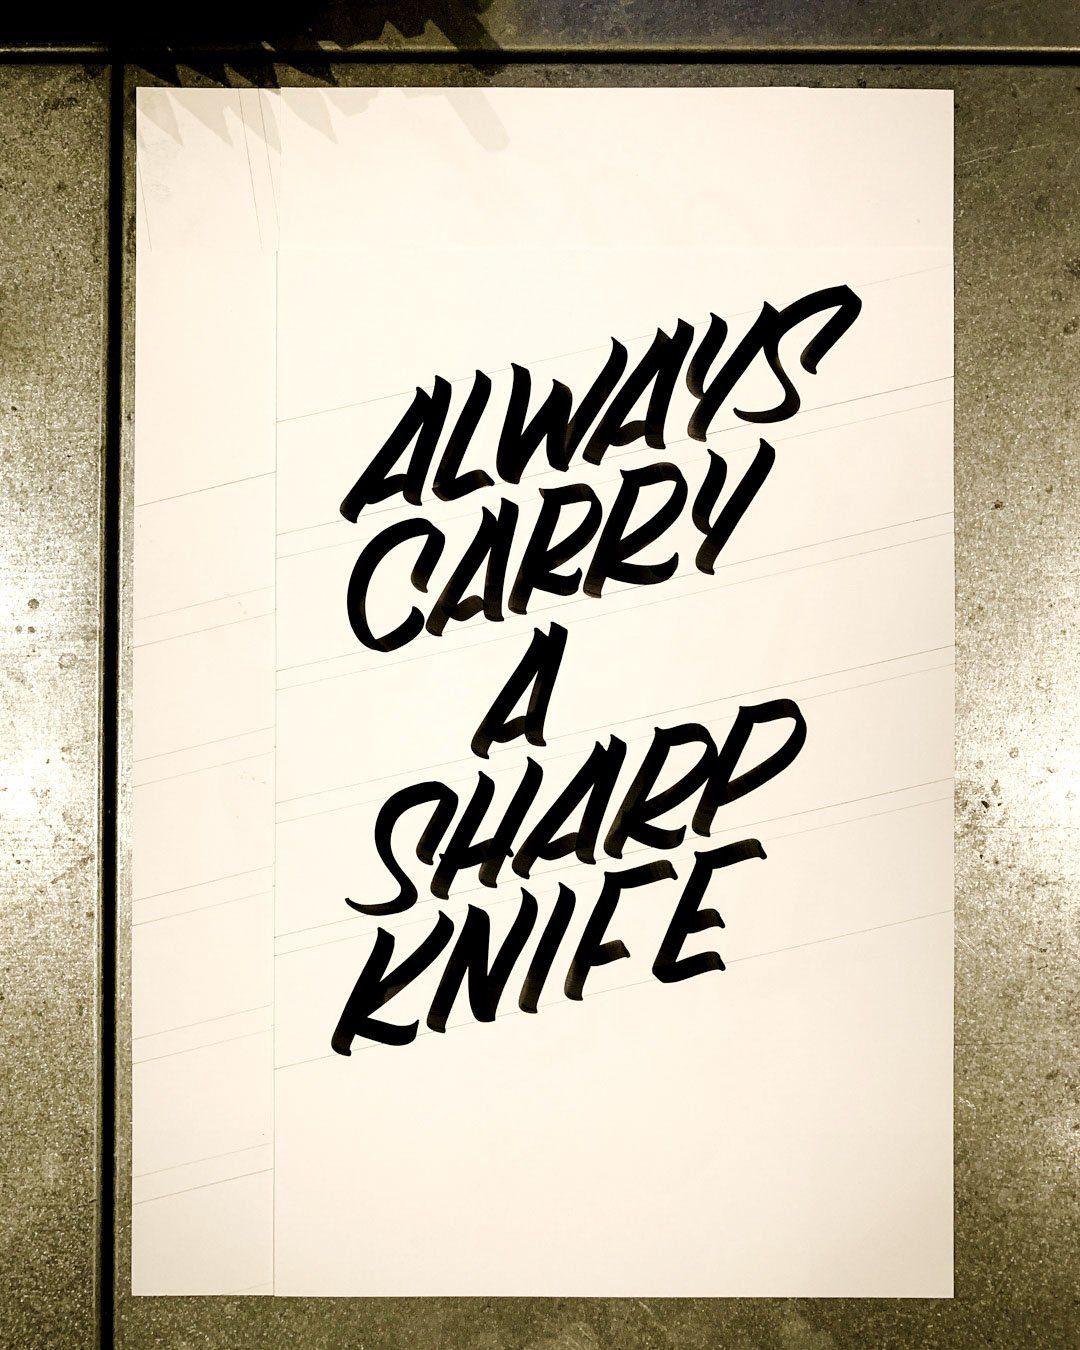 Always Carry A Sharp Knife